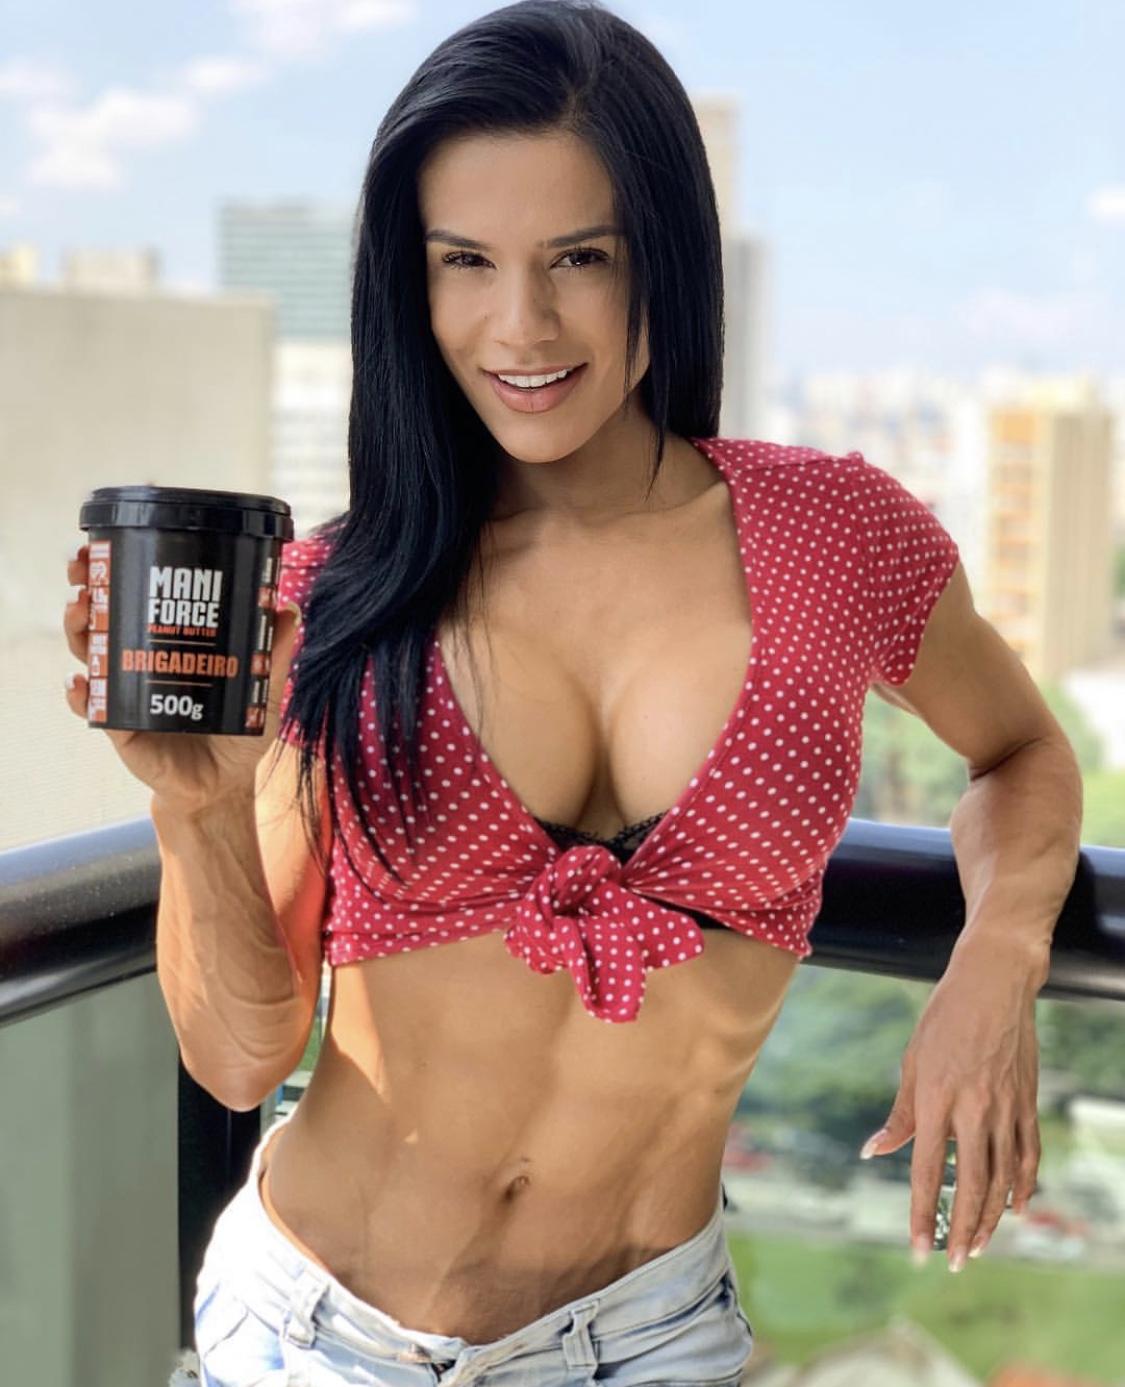 Eva andressa: тренировки и питание